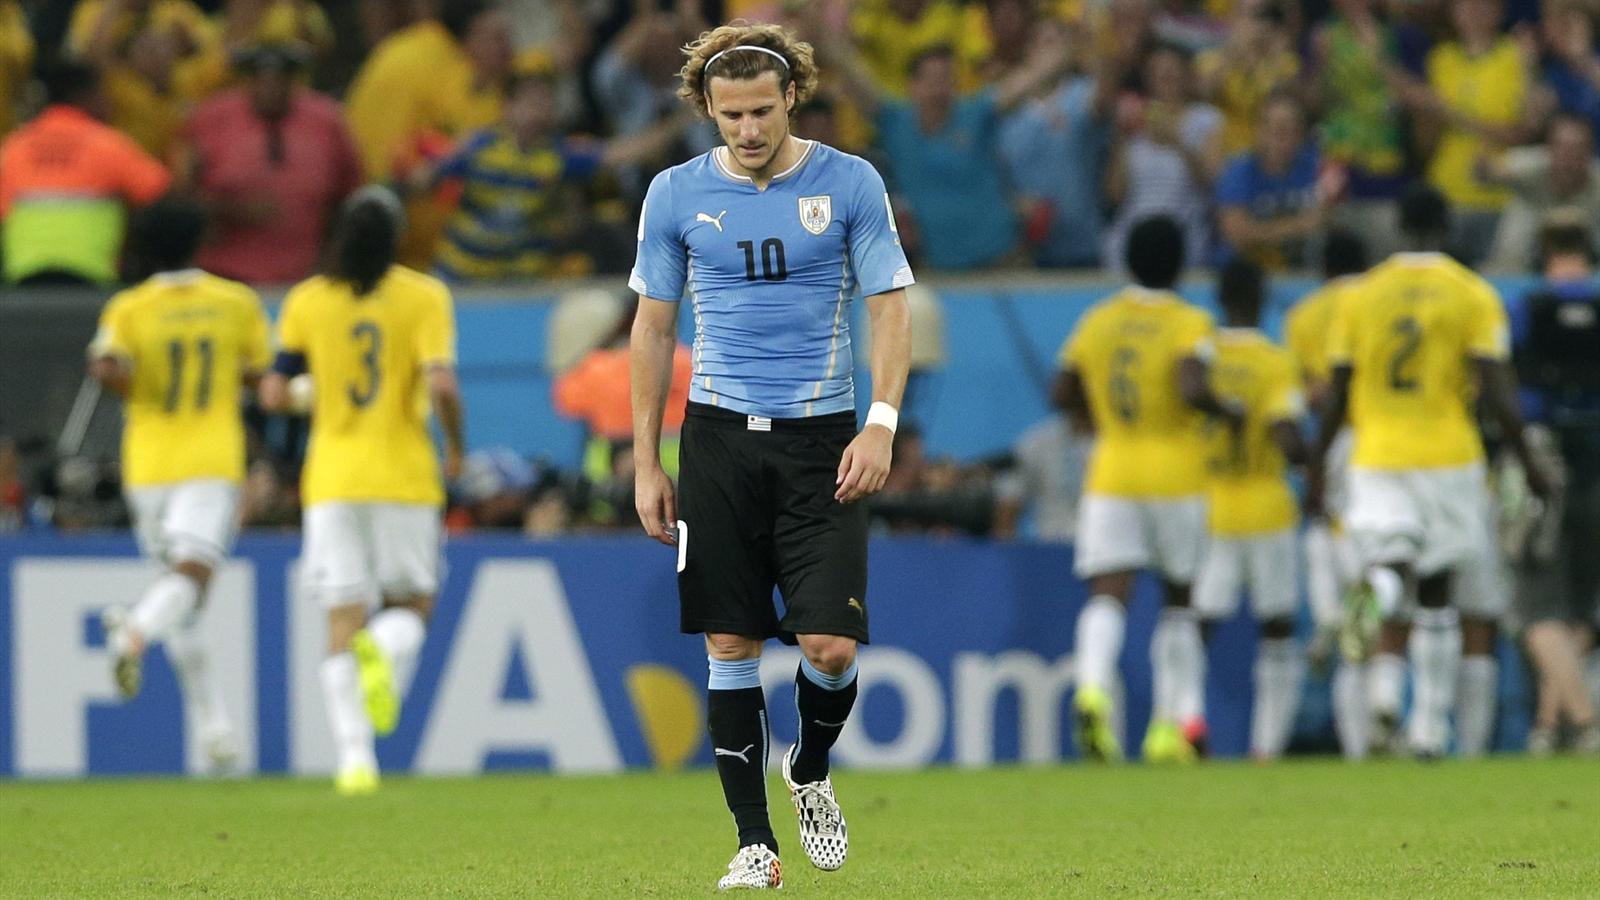 Diego Forlan Colombia Uruguay 2014 AP/LaPresse